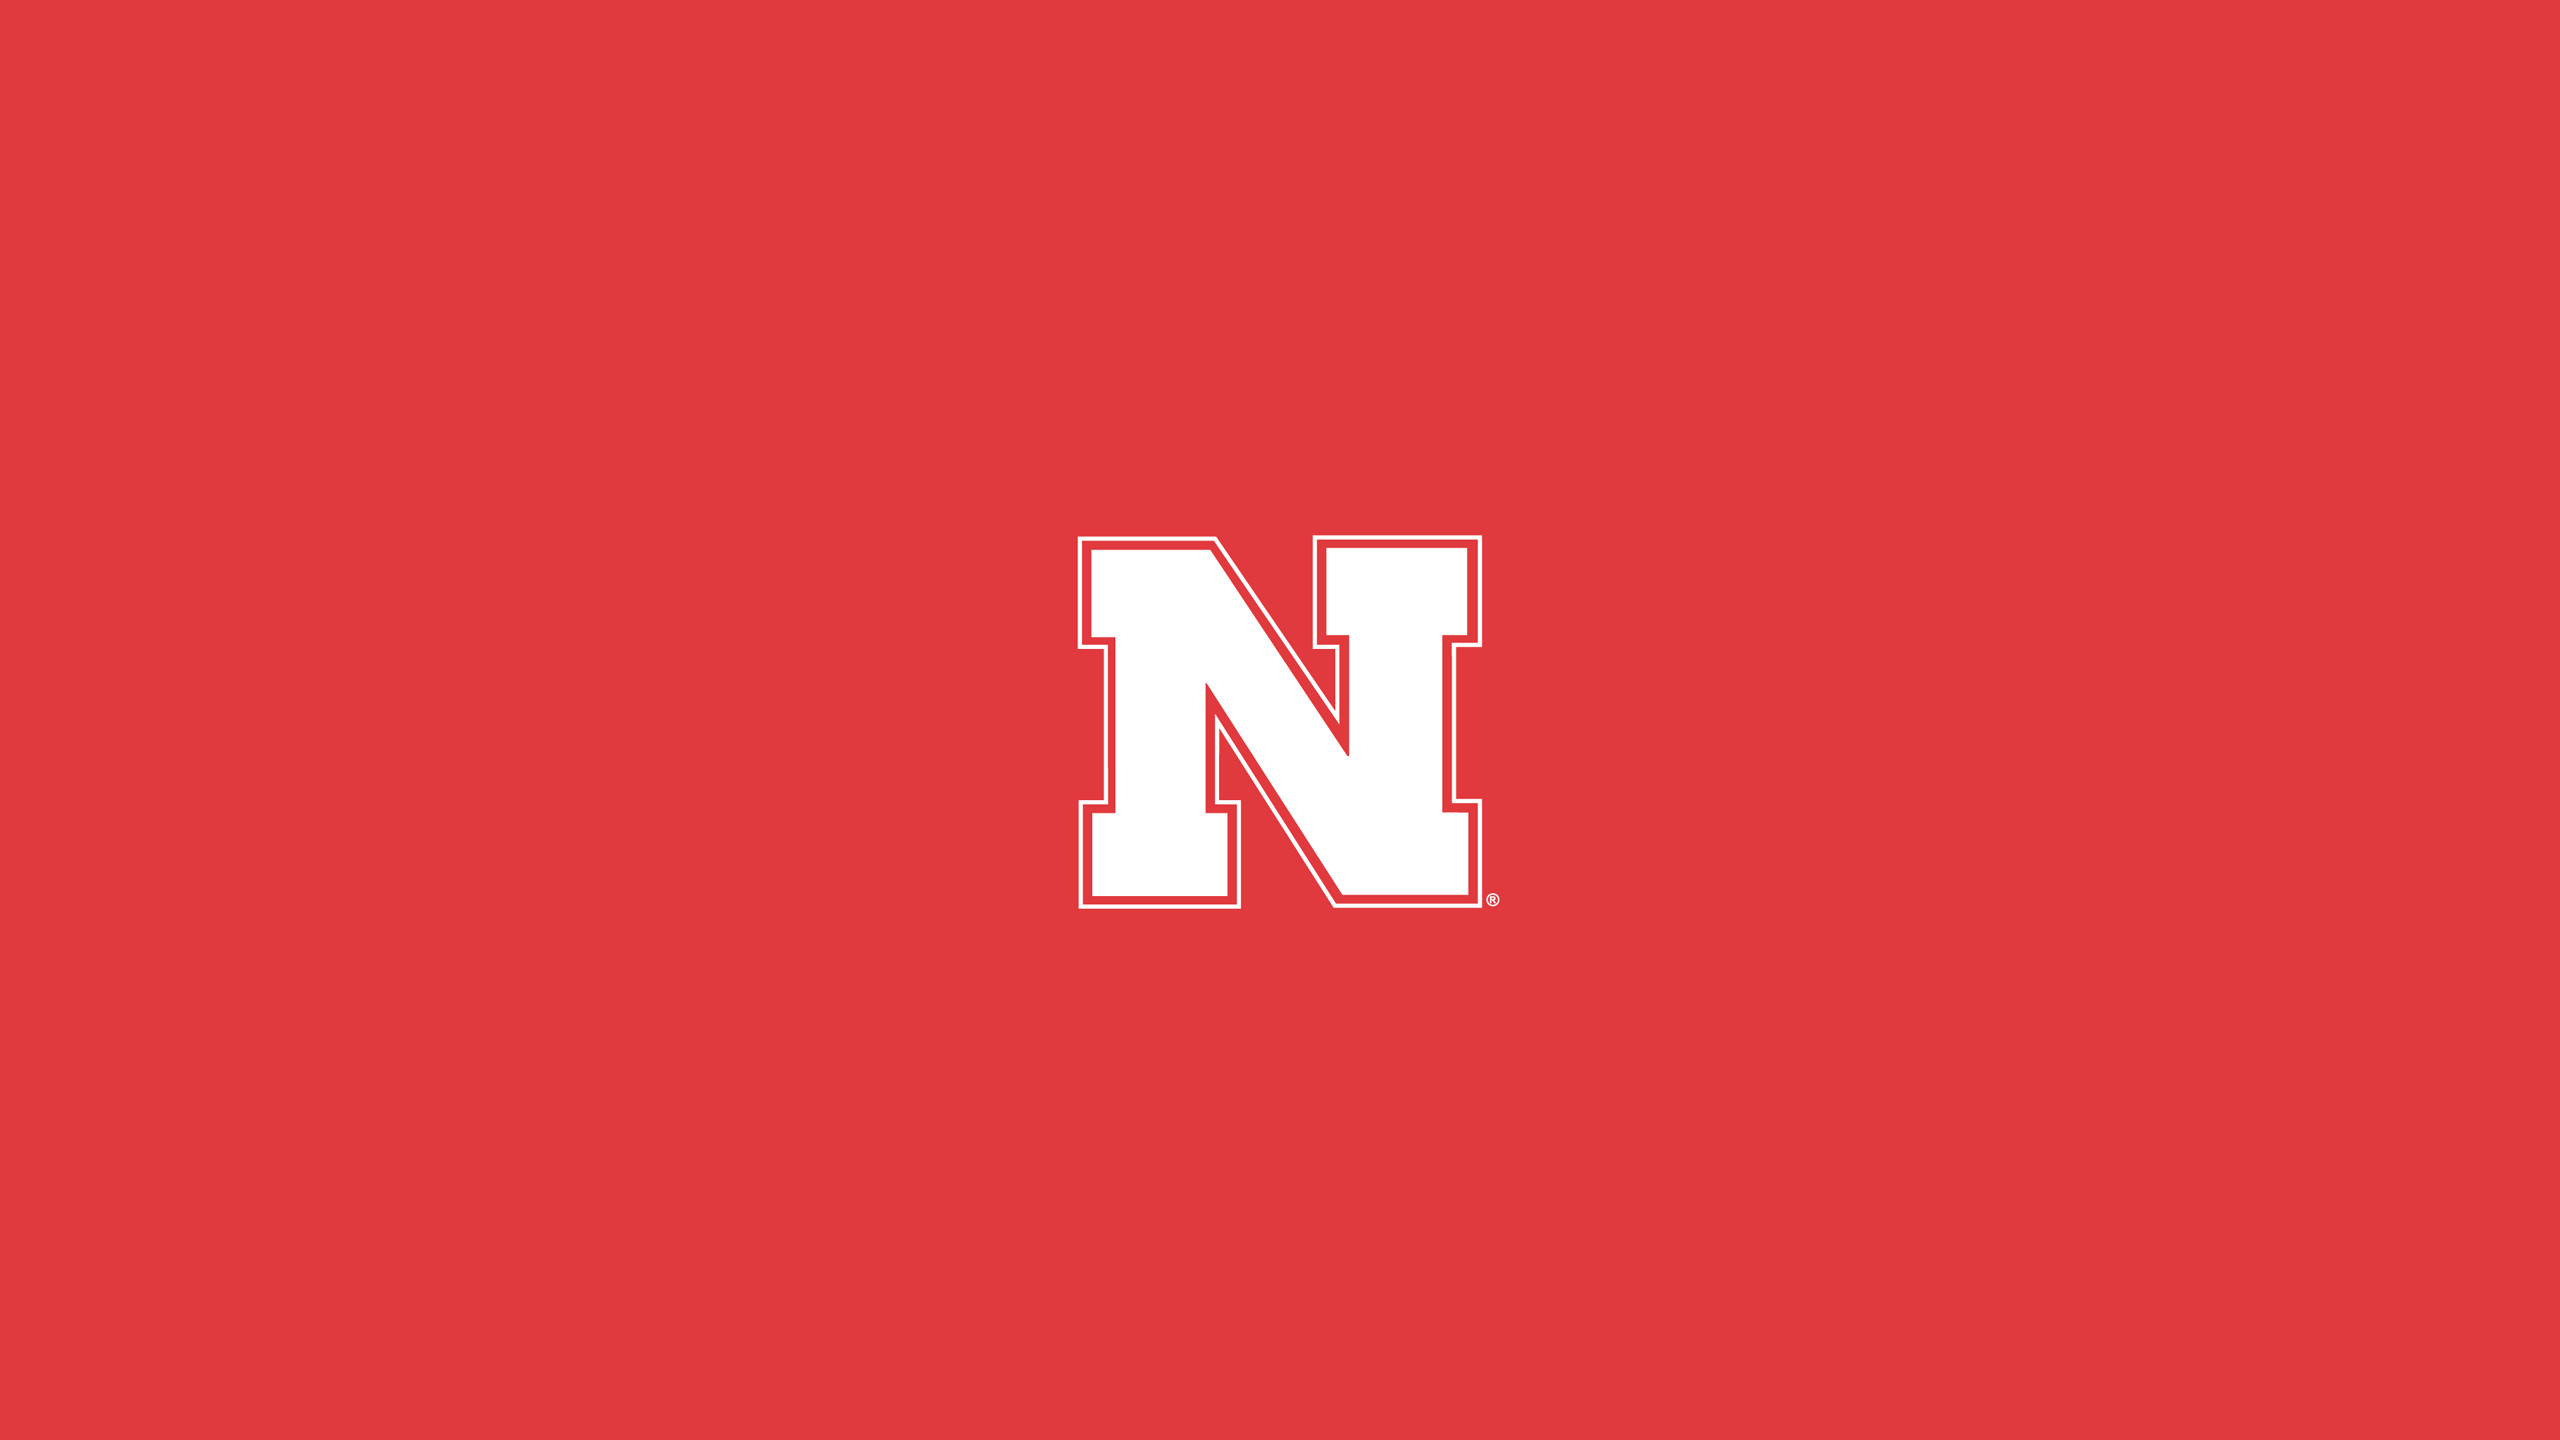 Widescreen Wallpapers of Nebraska HD › Gorgeous Images